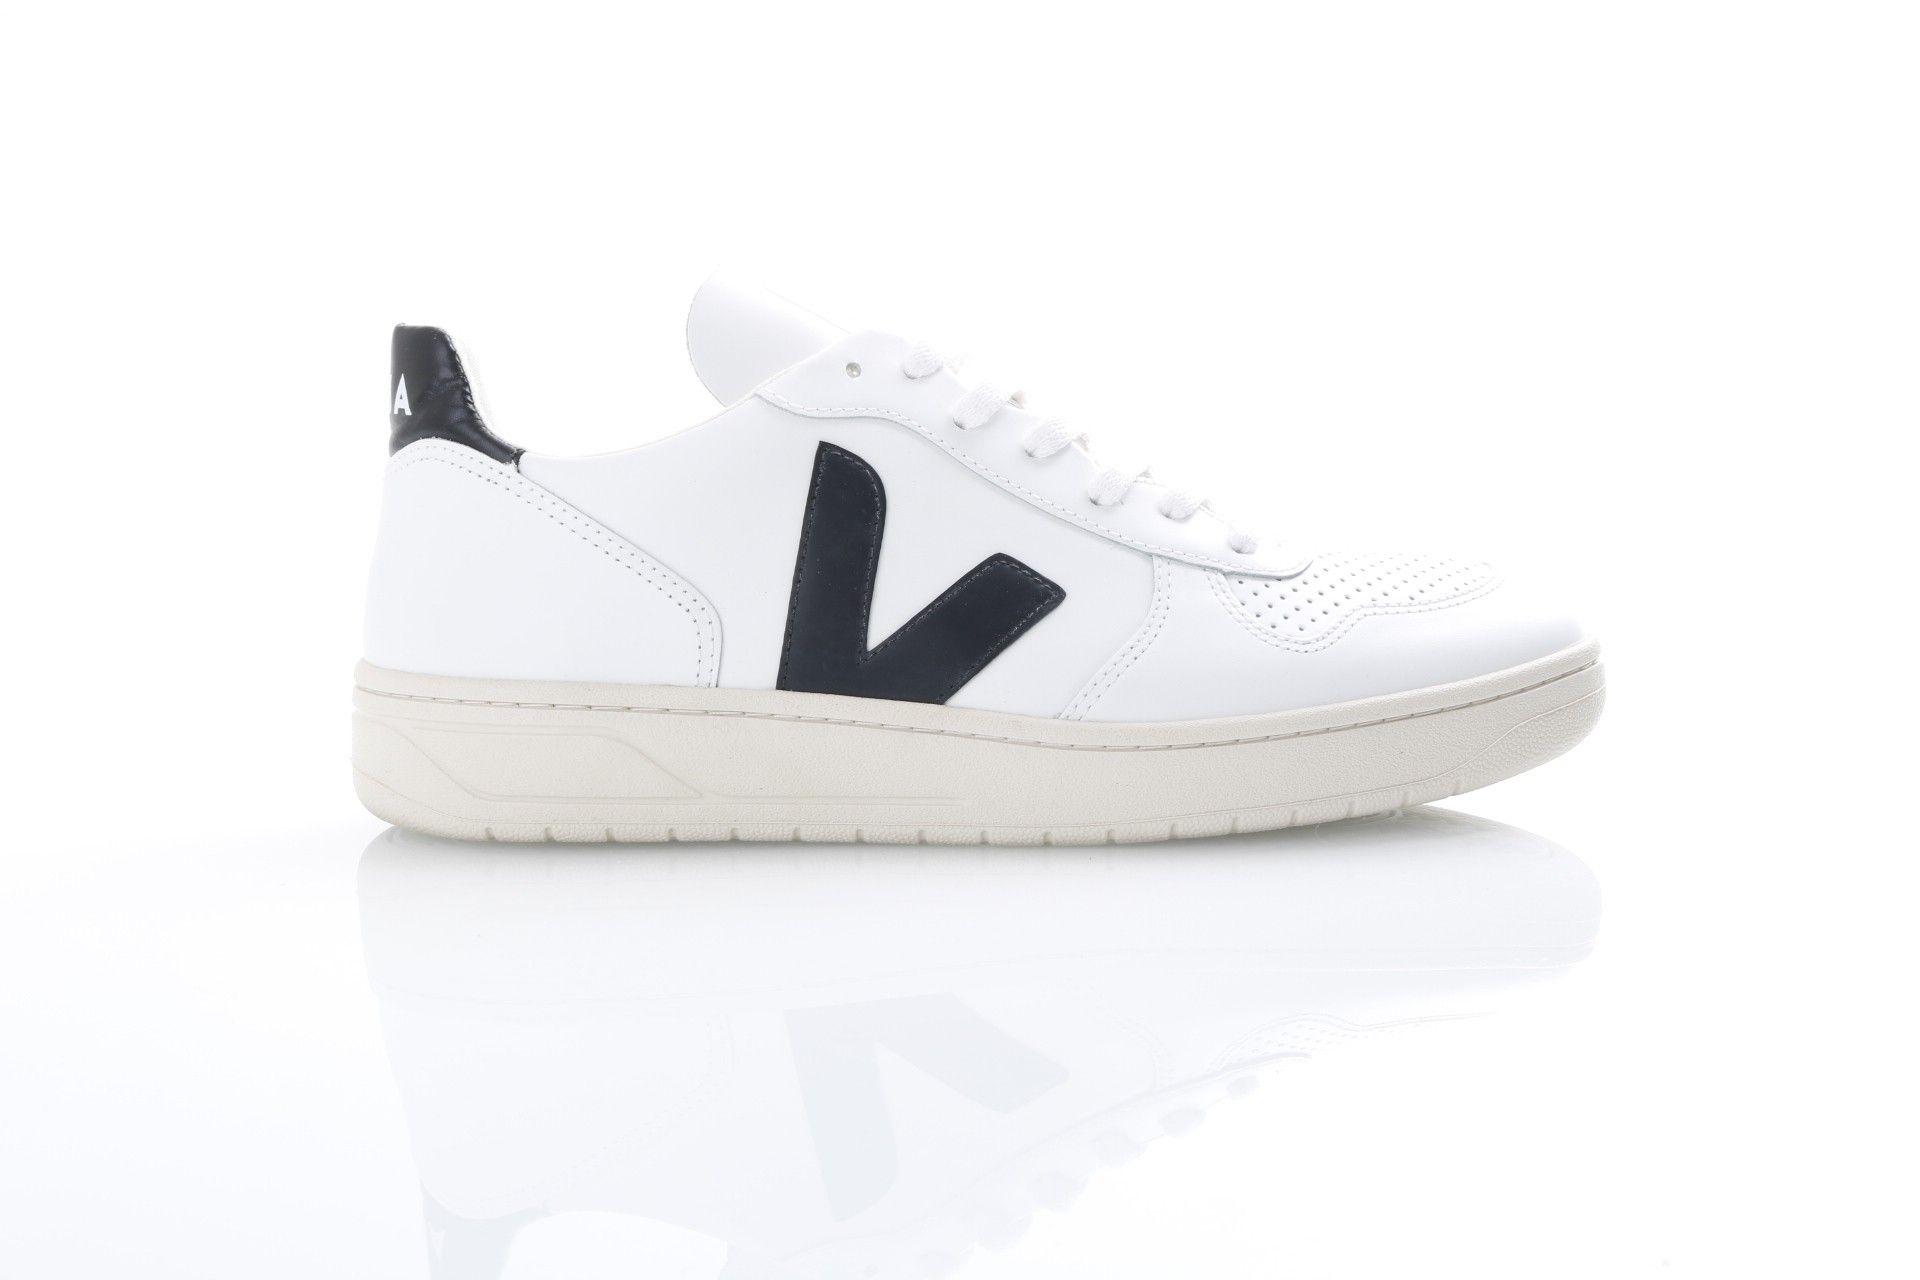 Afbeelding van Veja Vx020005 Sneakers V-10 Leather Extra White/Black